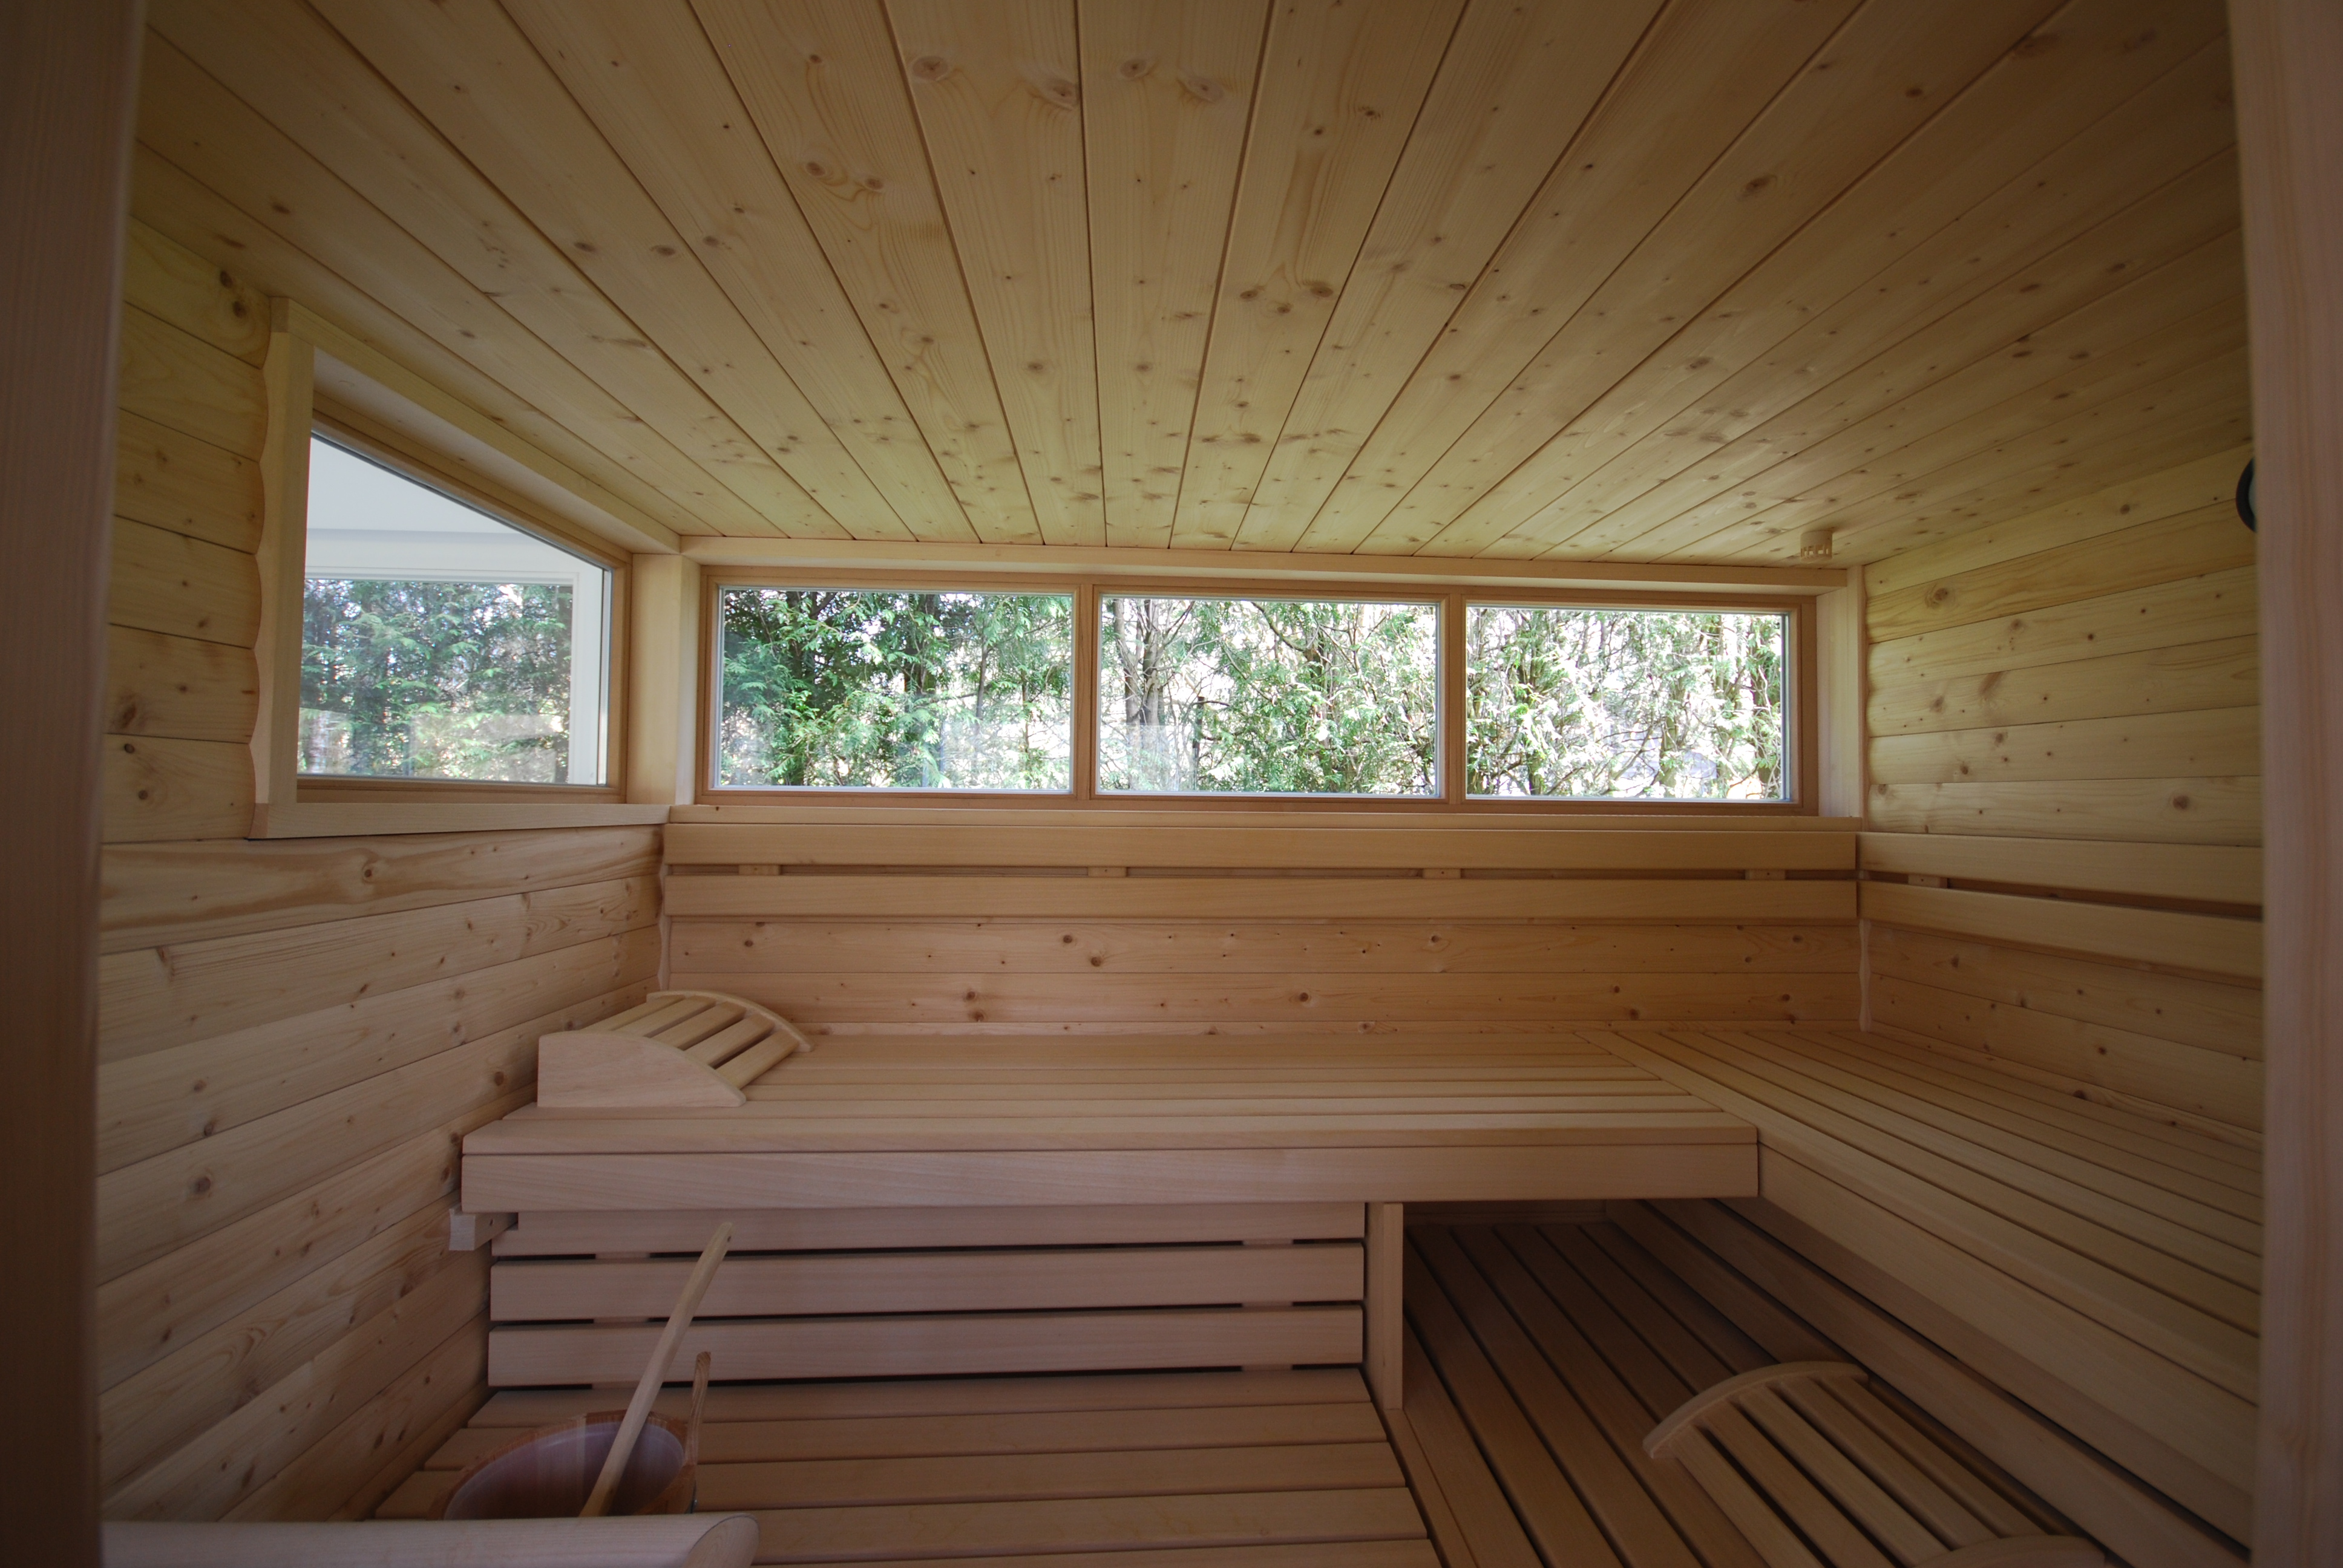 exklusive massivholzsauna reinbold saunabau. Black Bedroom Furniture Sets. Home Design Ideas